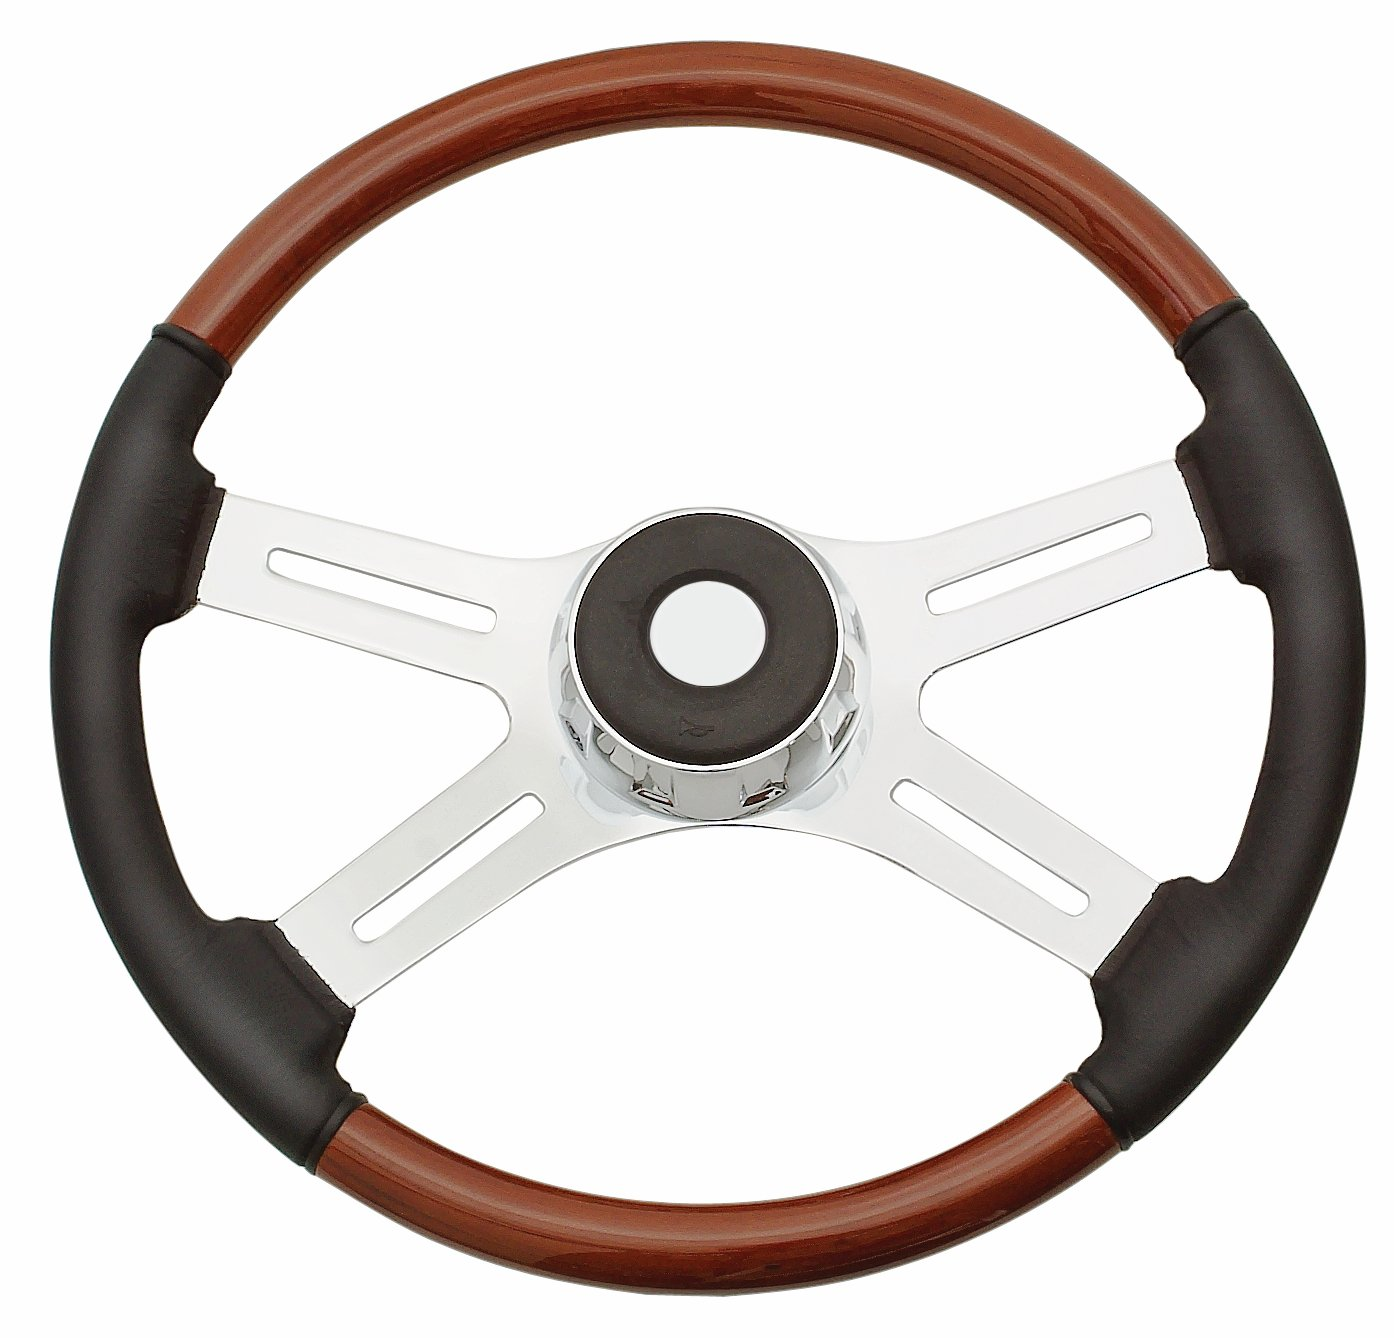 Woody's WP-SWKW9701L Rosewood Chrome Truck Steering Wheel (Beautiful African Hardwood)